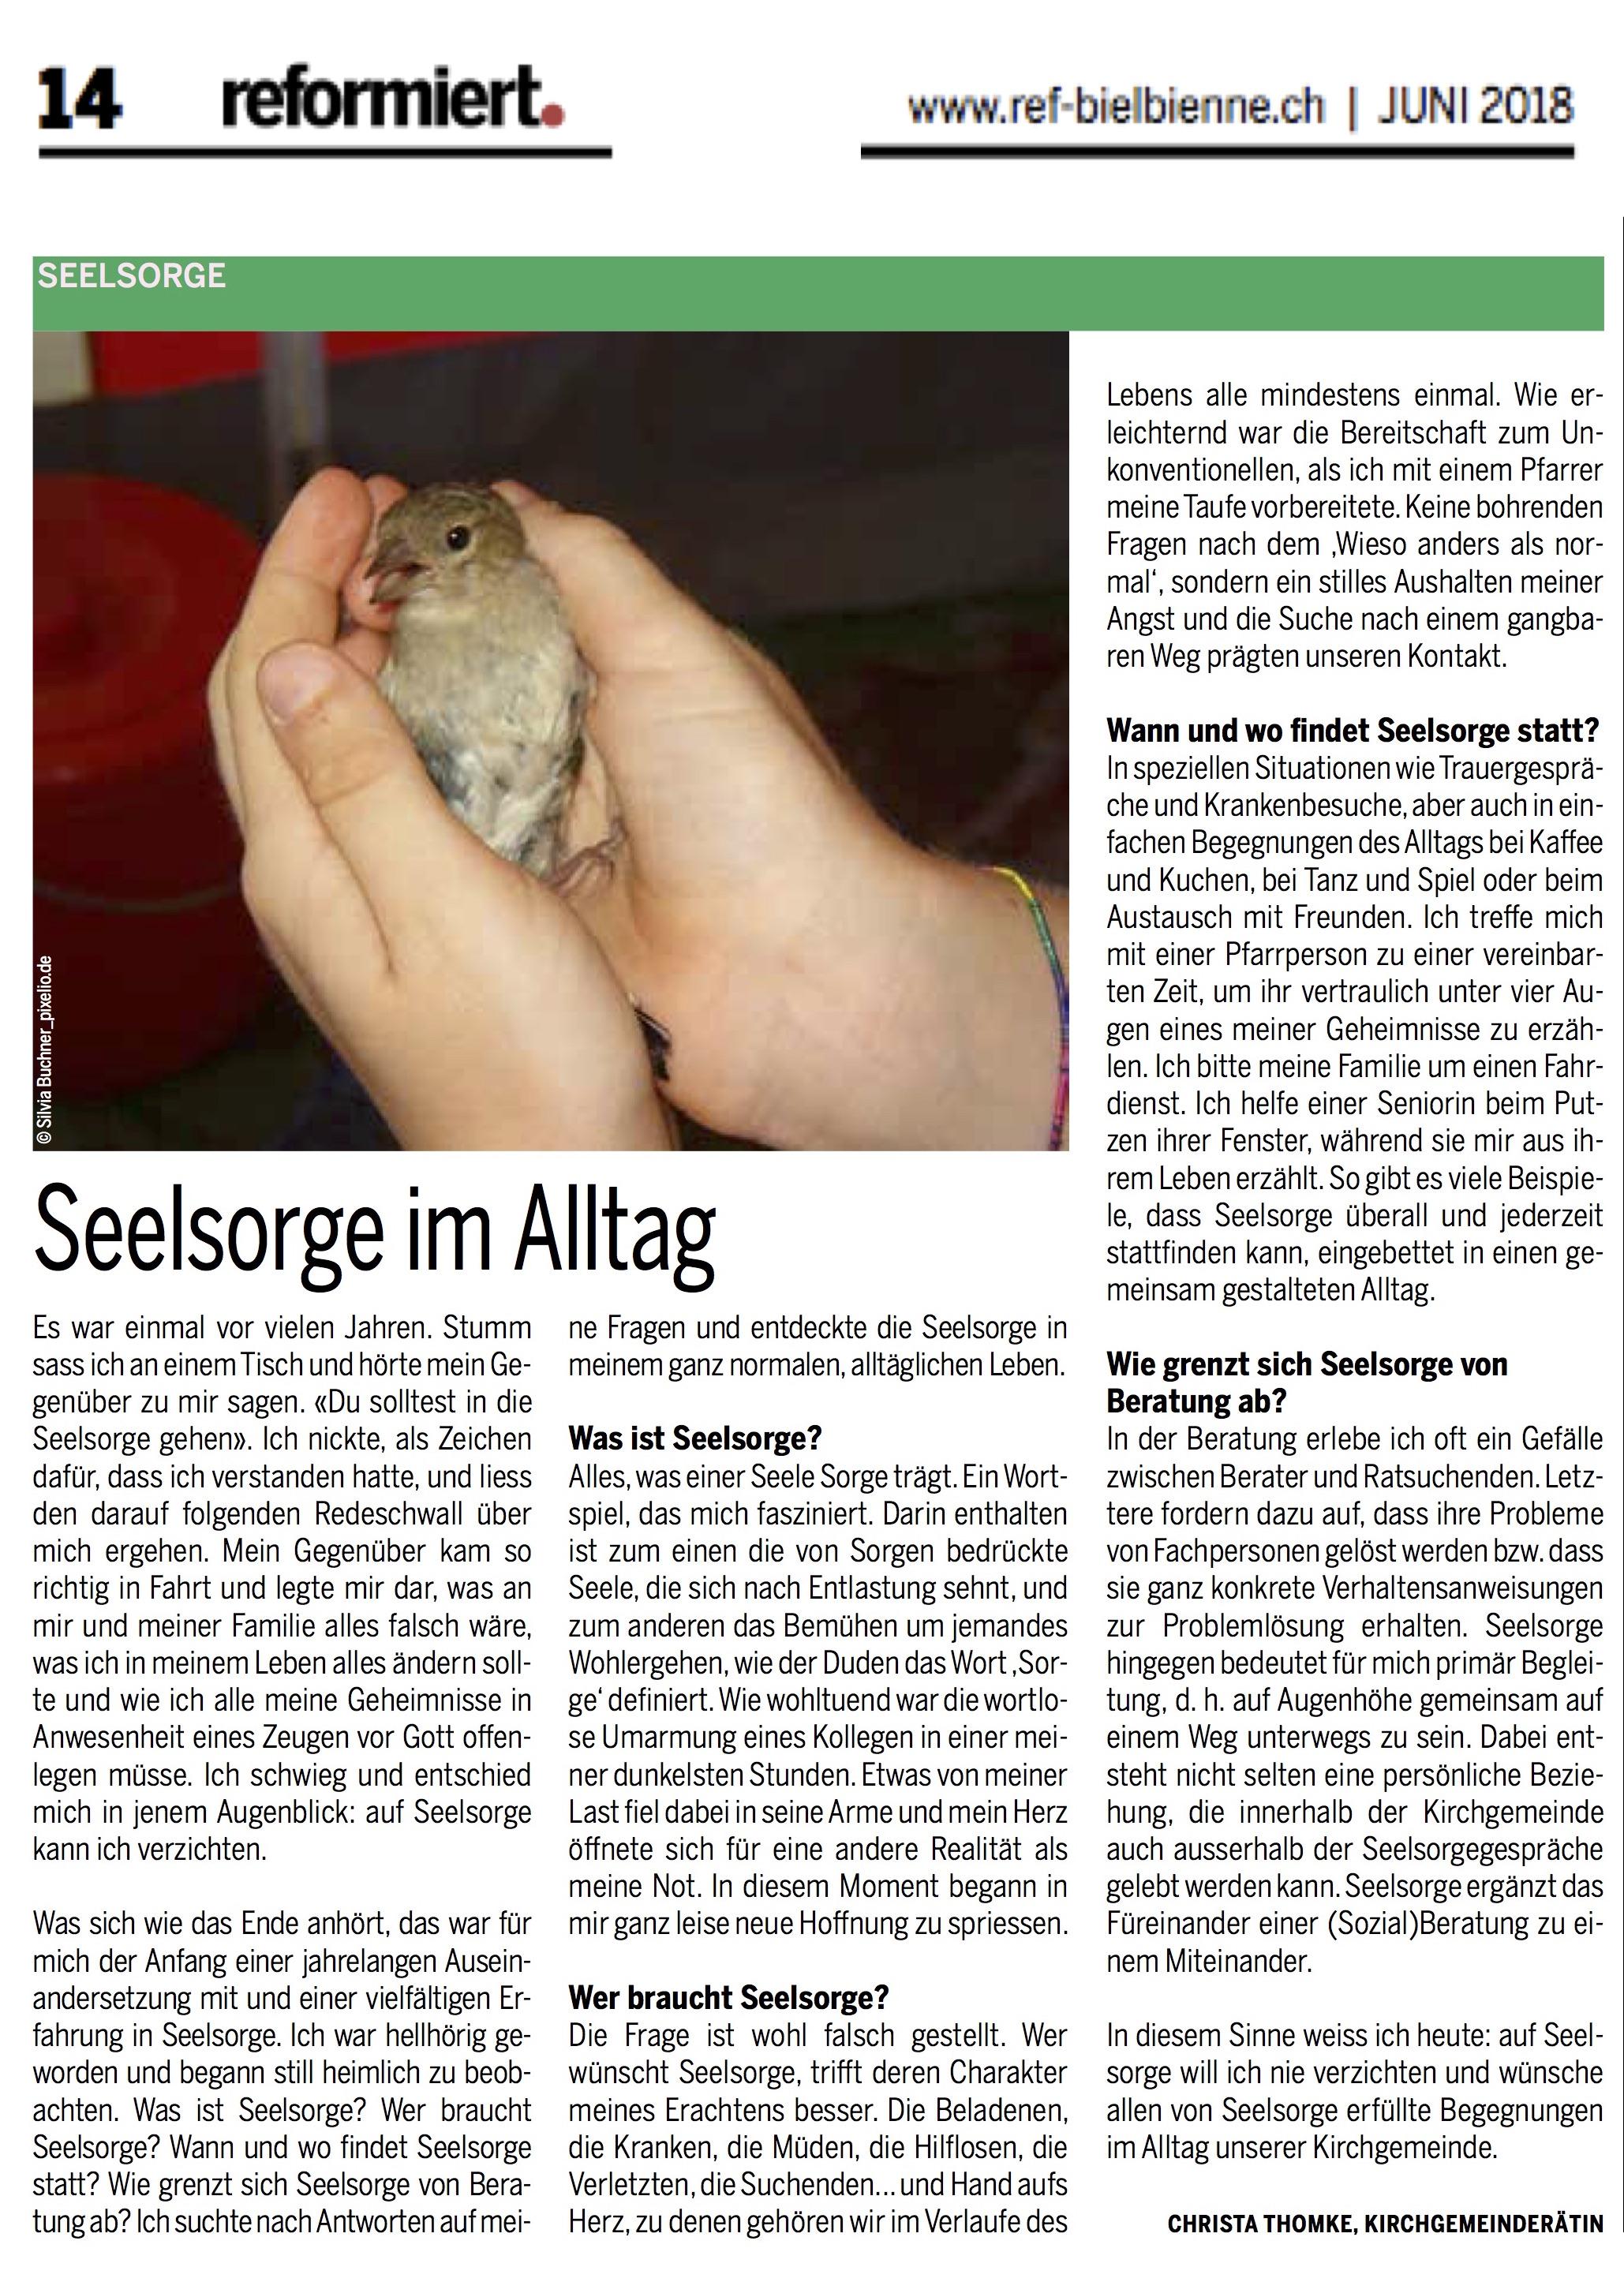 © reformiert. (Bieler Ausgabe), Juni 2018, S. 14